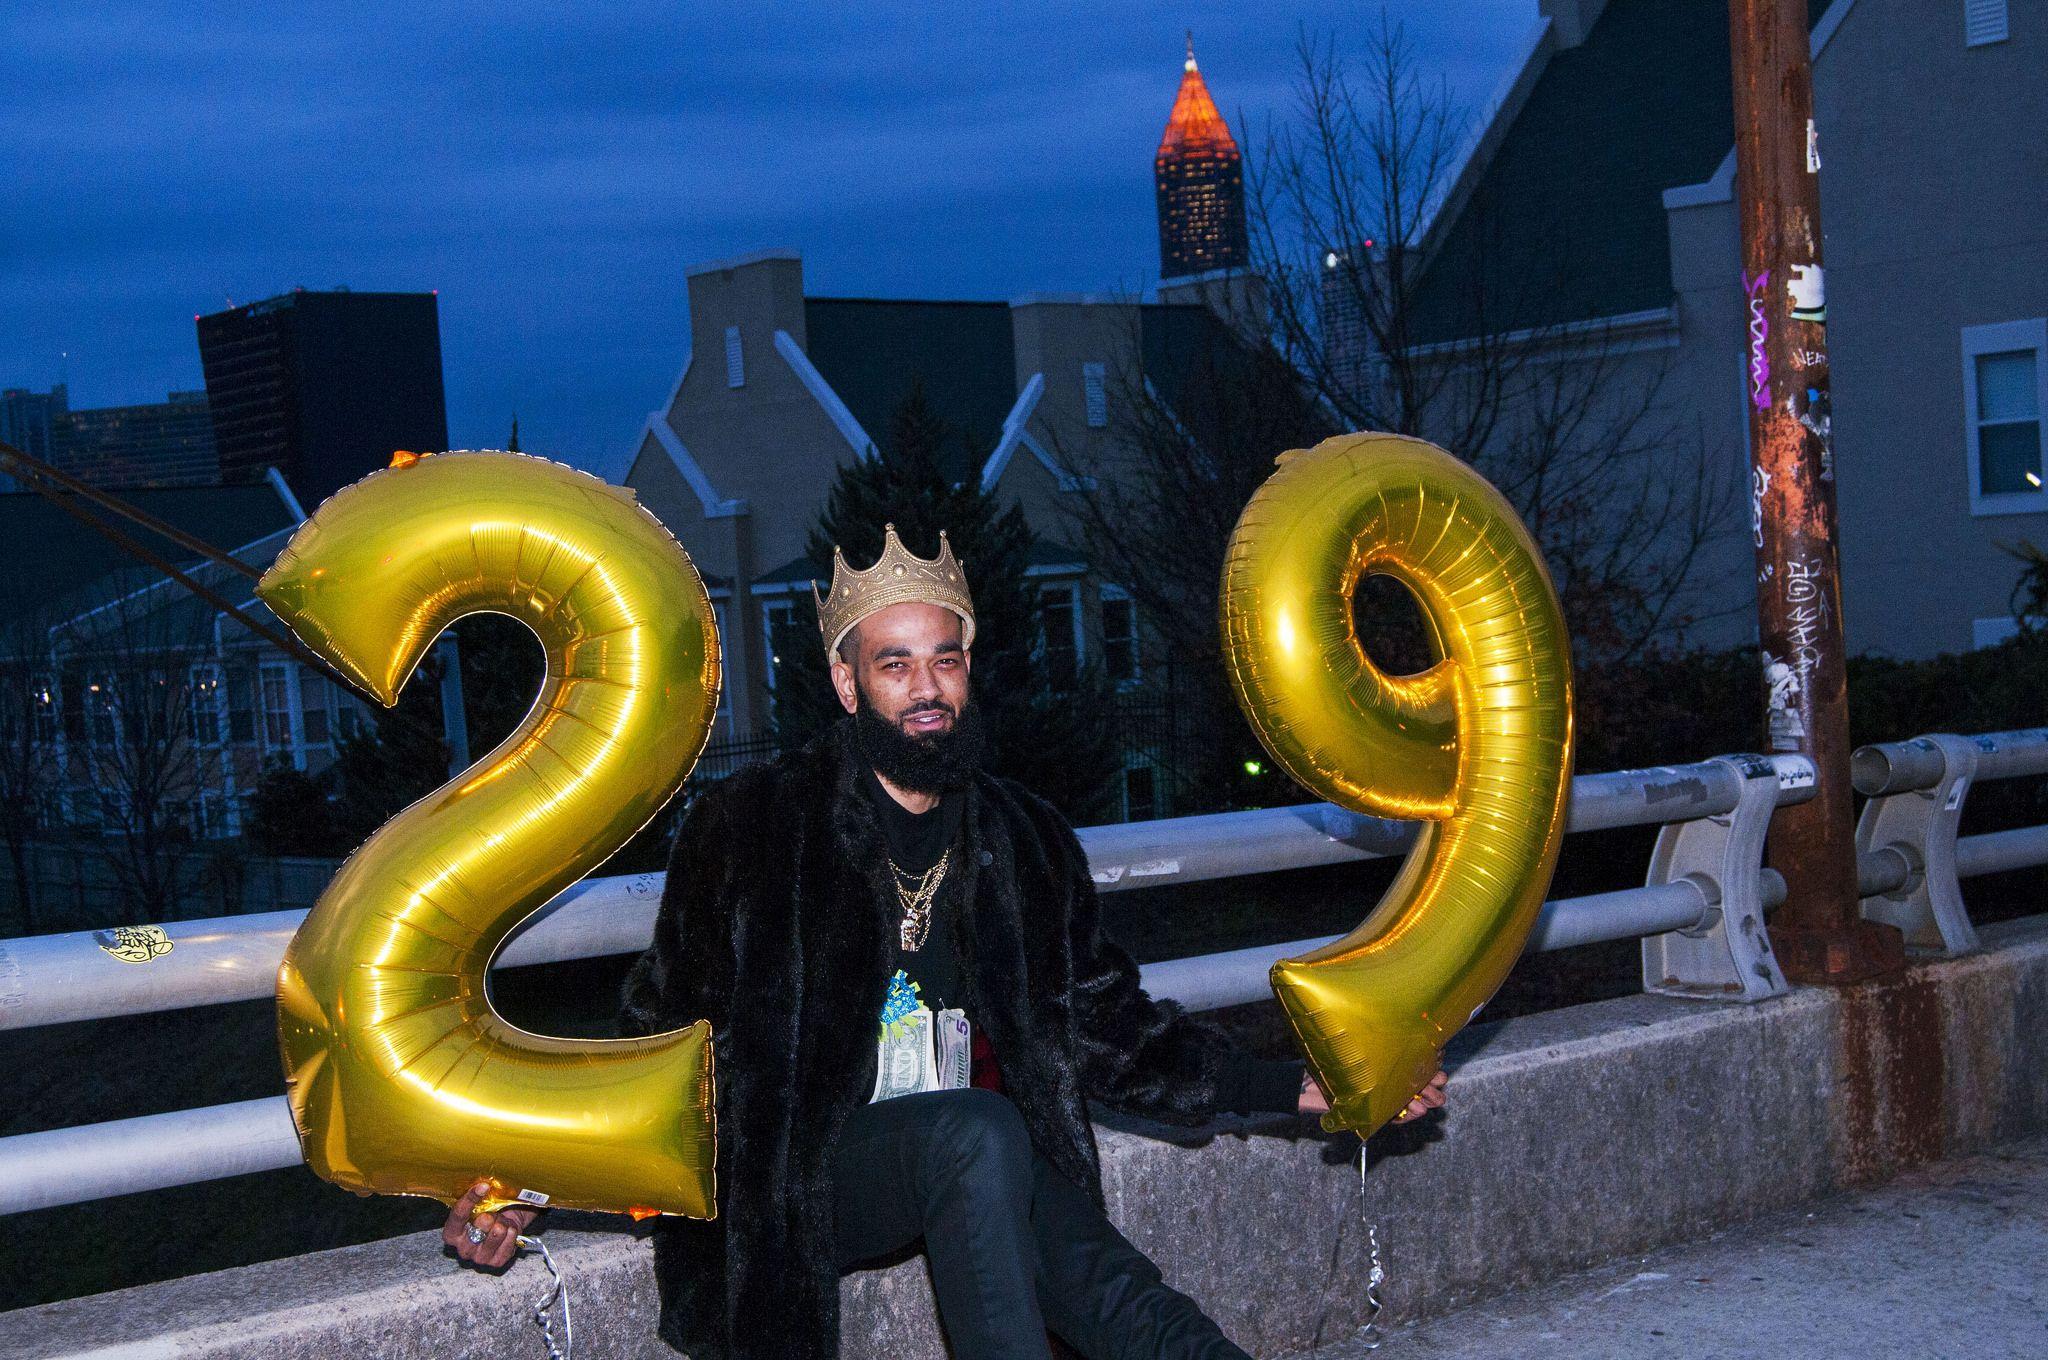 https://flic.kr/p/RAKDwX | Happy birthday to me | Jackson Street Bridge. A good place to star the party.#birth #day #Happy #streetphotography